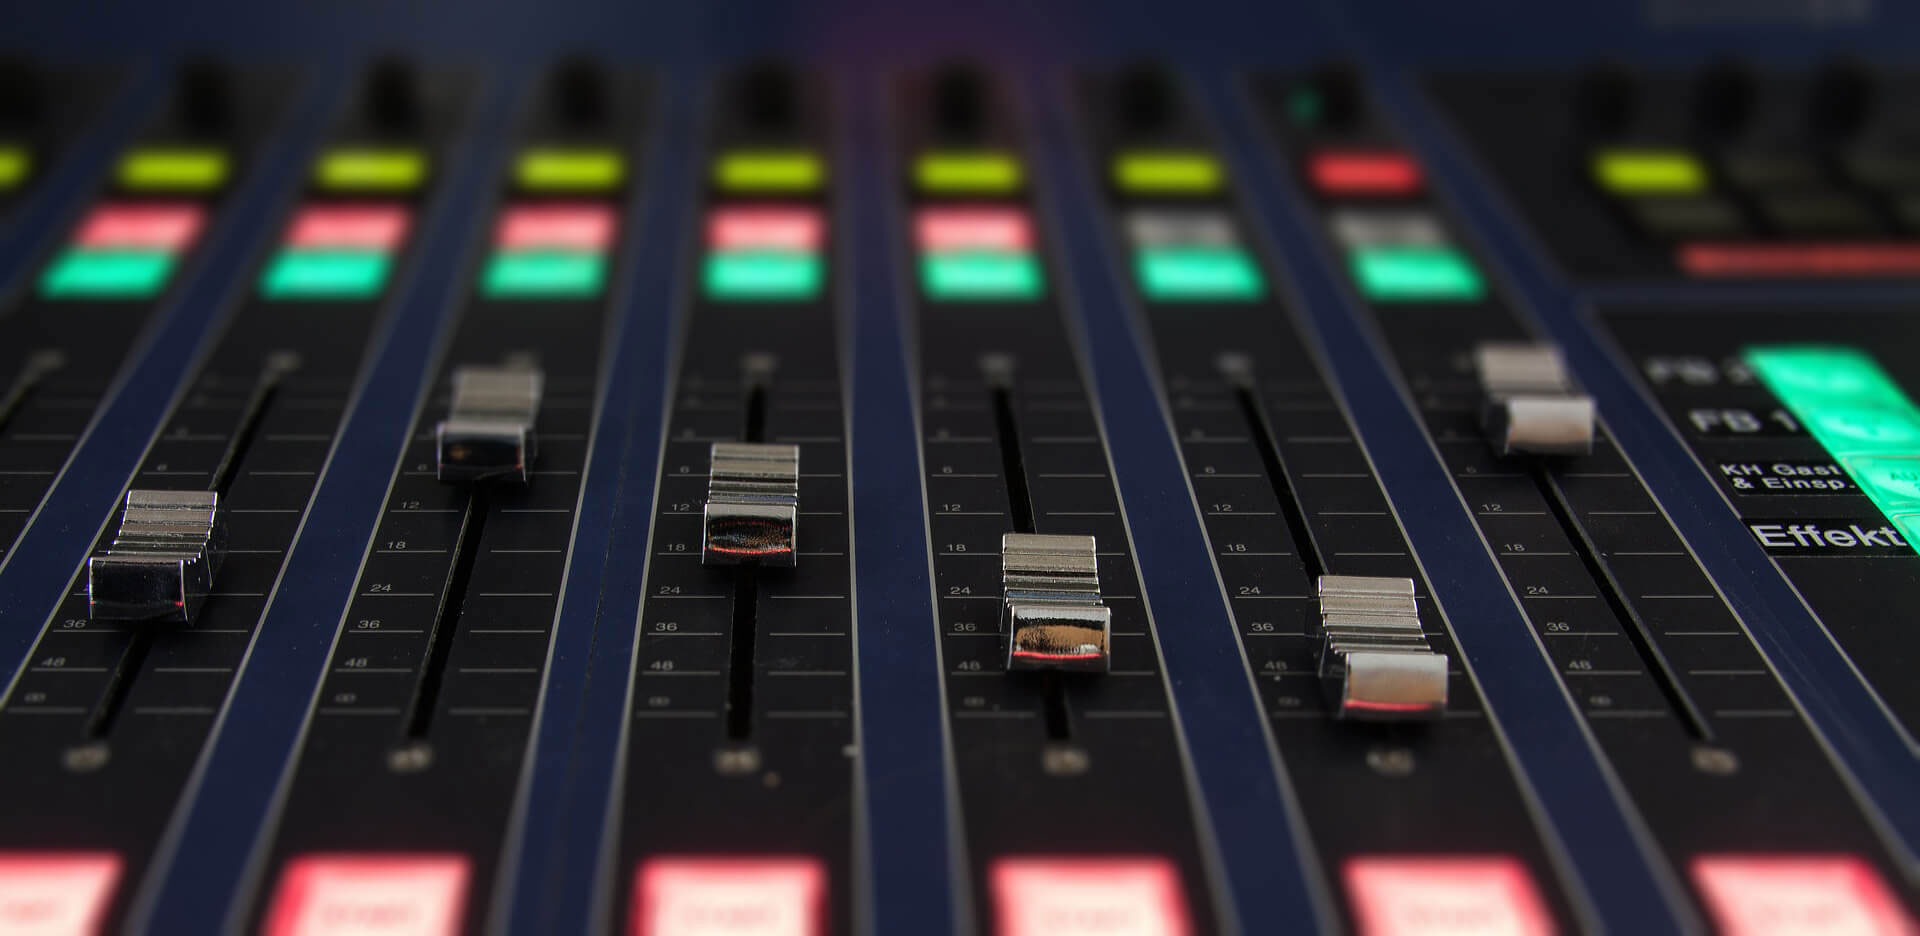 broadcastmixer